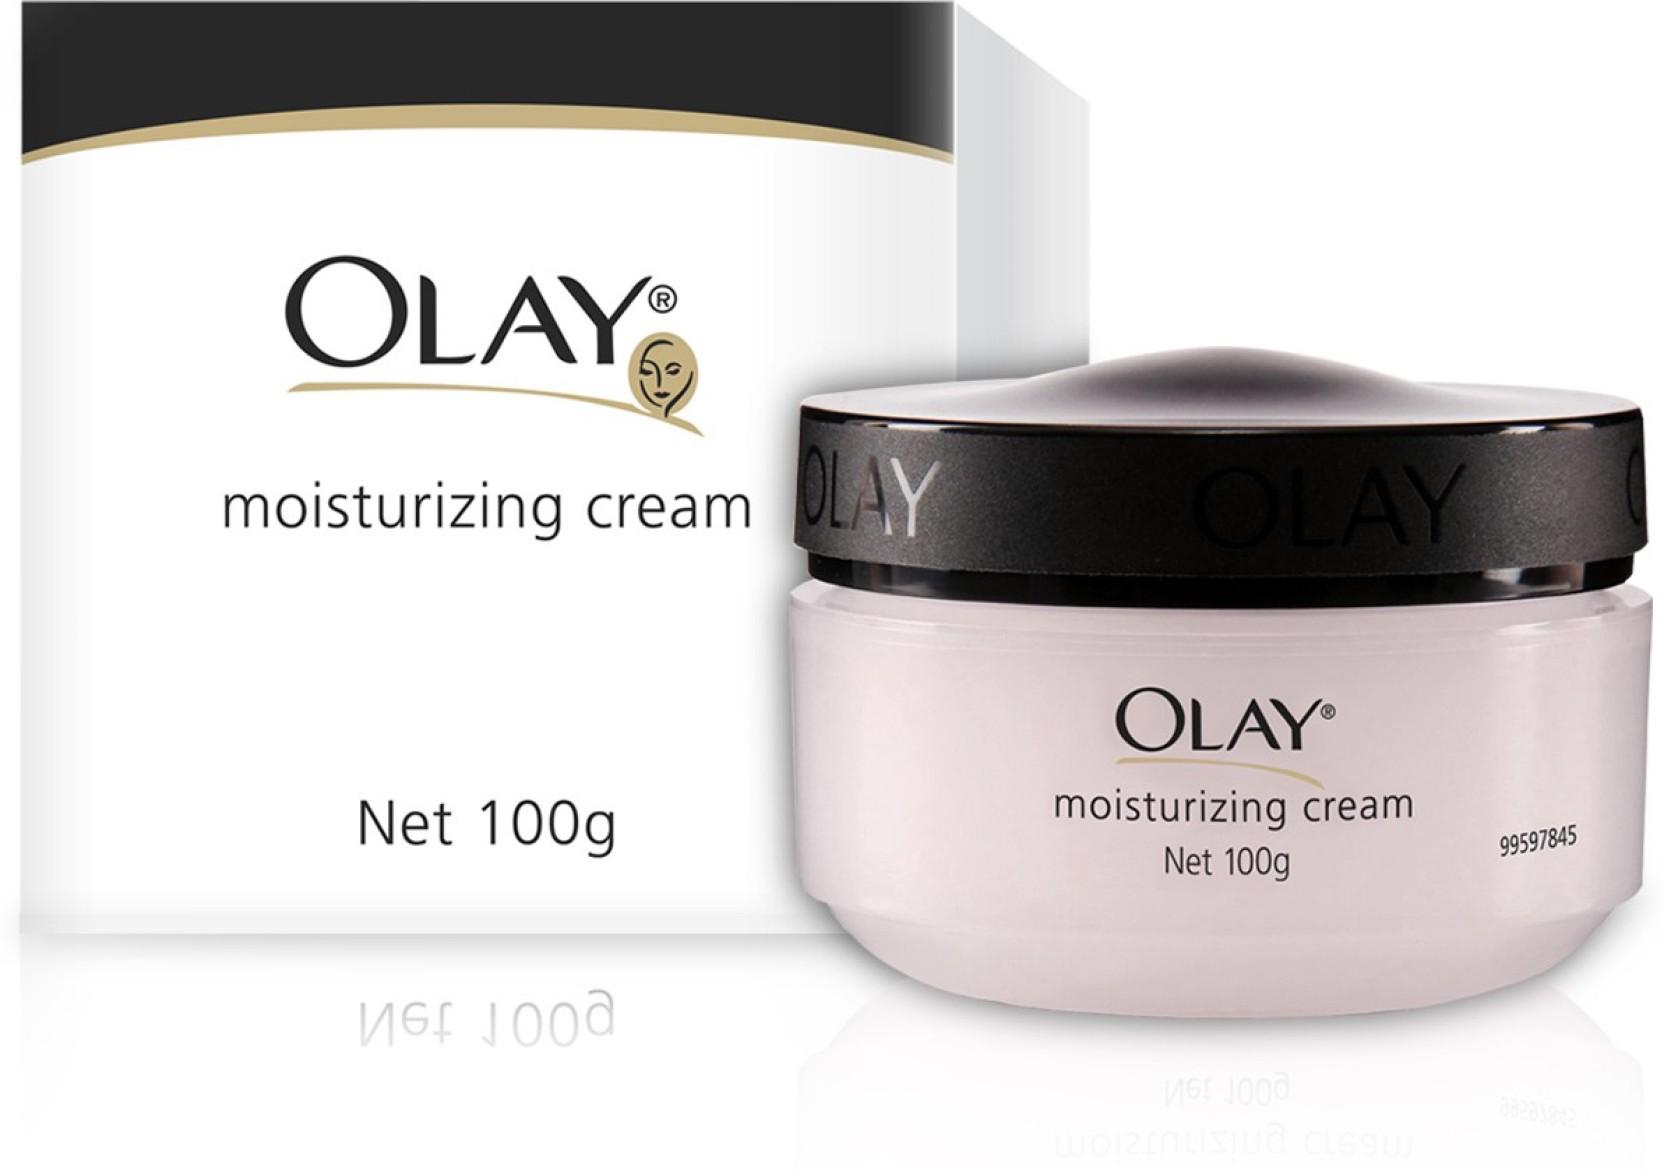 Olay Moisturizing Cream Price In India Buy Moisturising Lotion Add To Cart